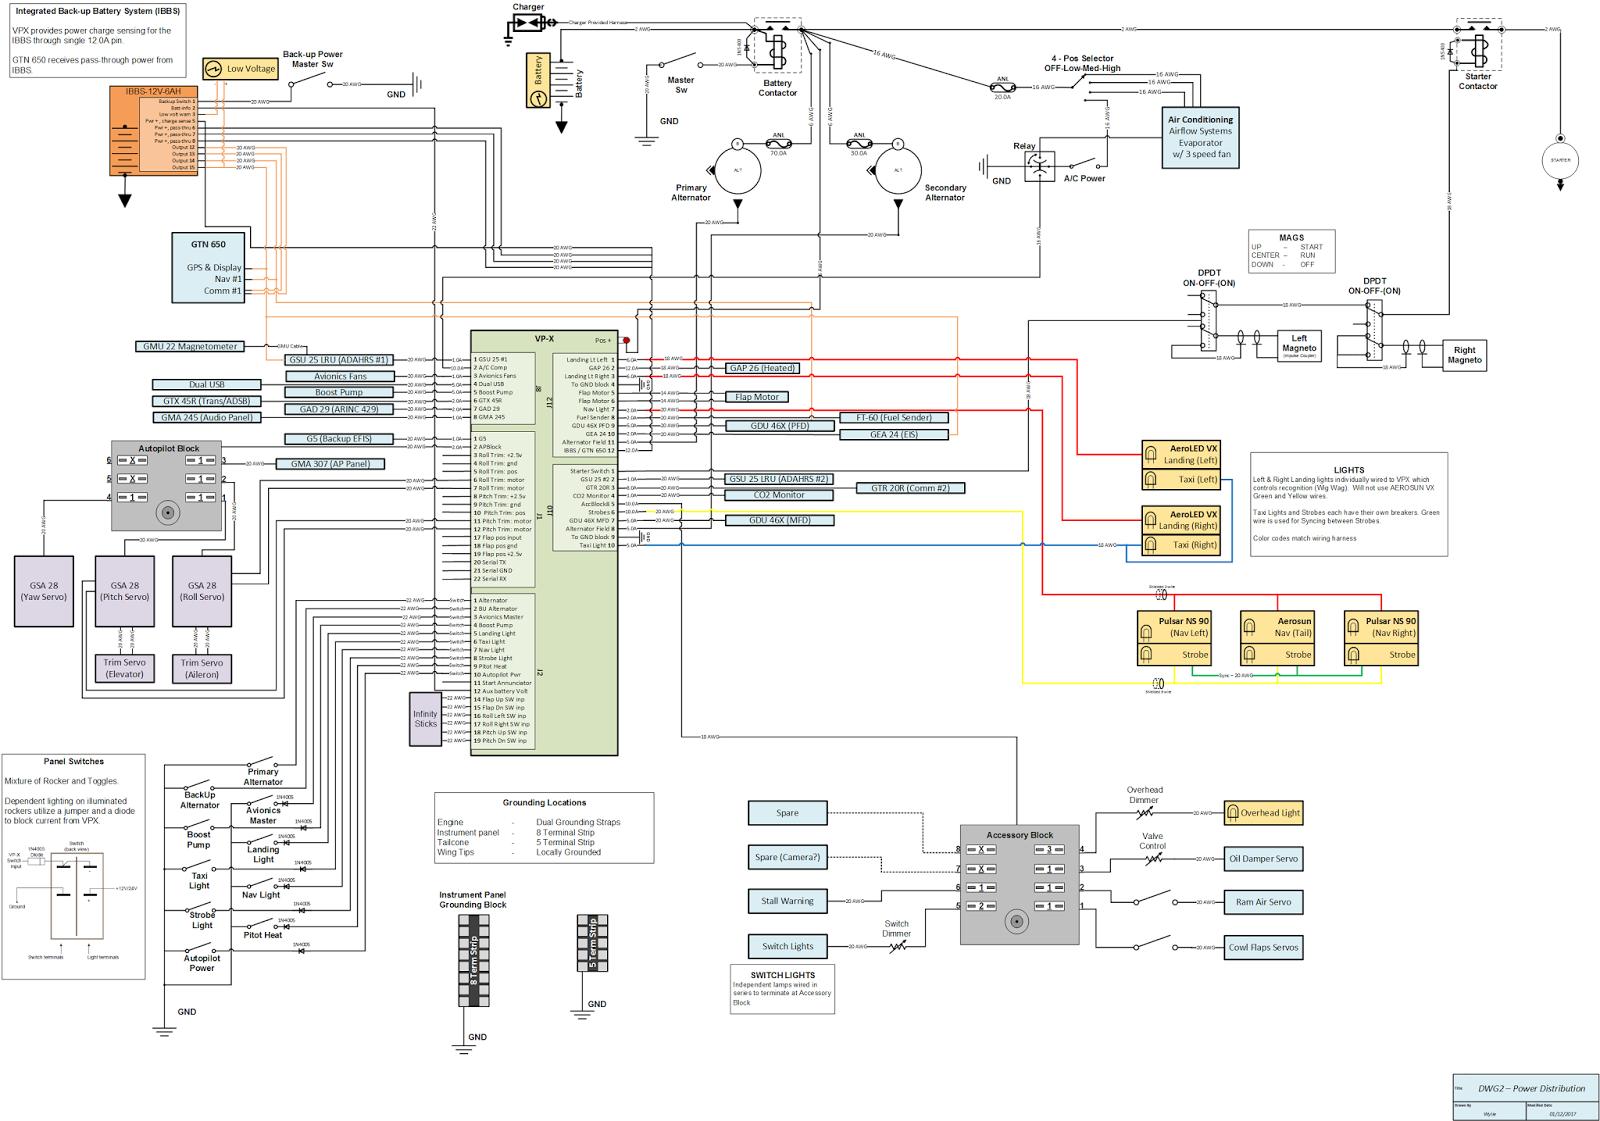 Rv 6 Aircraft Wiring Diagram. . Wiring Diagram Aircraft Wiring Diagram Rv on